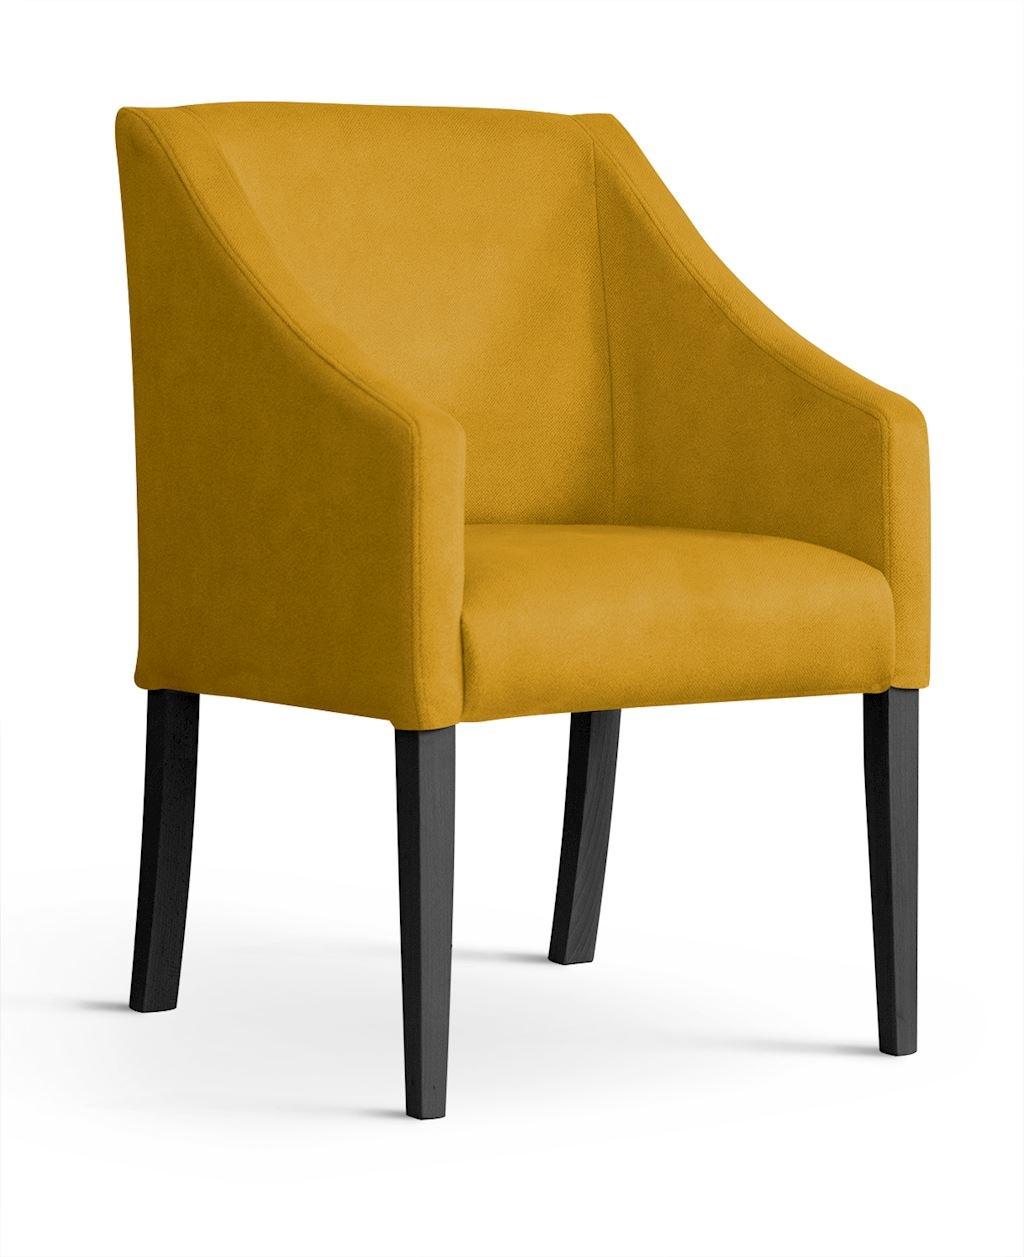 Fotoliu fix tapitat cu stofa si picioare din lemn Capri Velvet Mustariu / Negru, l58xA60xH89 cm somproduct.ro